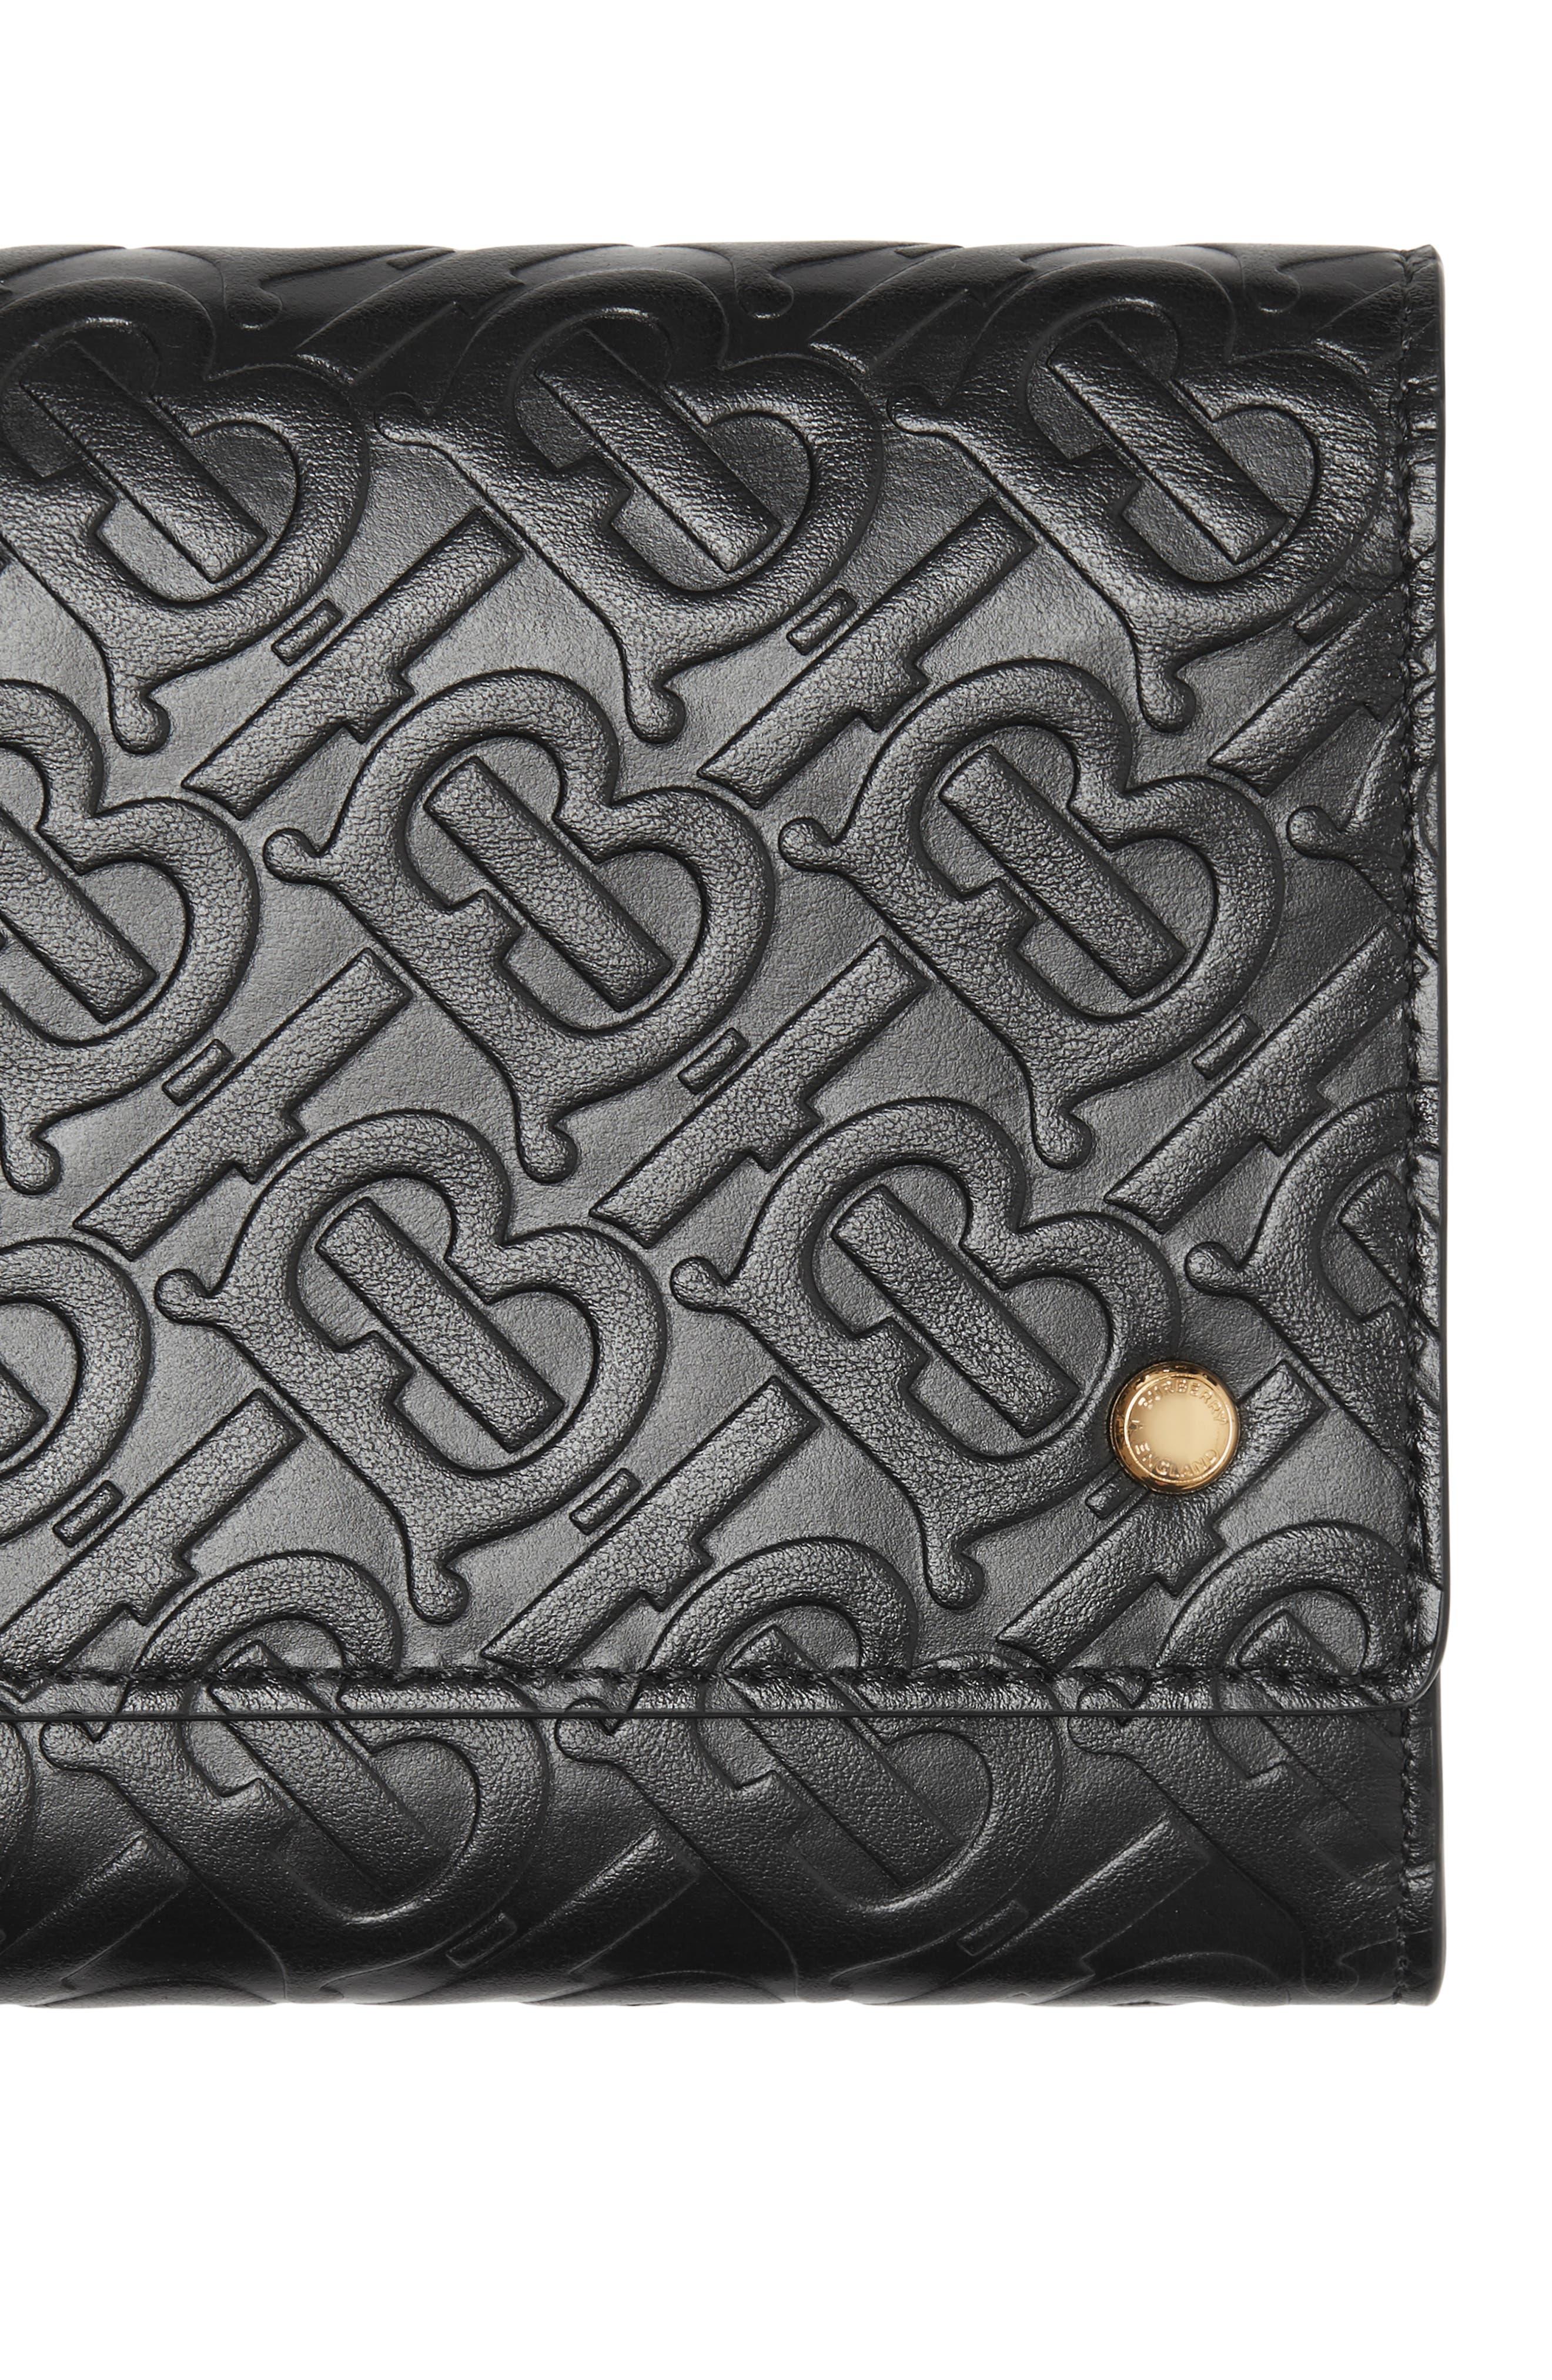 BURBERRY,                             Monogram Embossed Leather Crossbody Wallet,                             Alternate thumbnail 7, color,                             BLACK